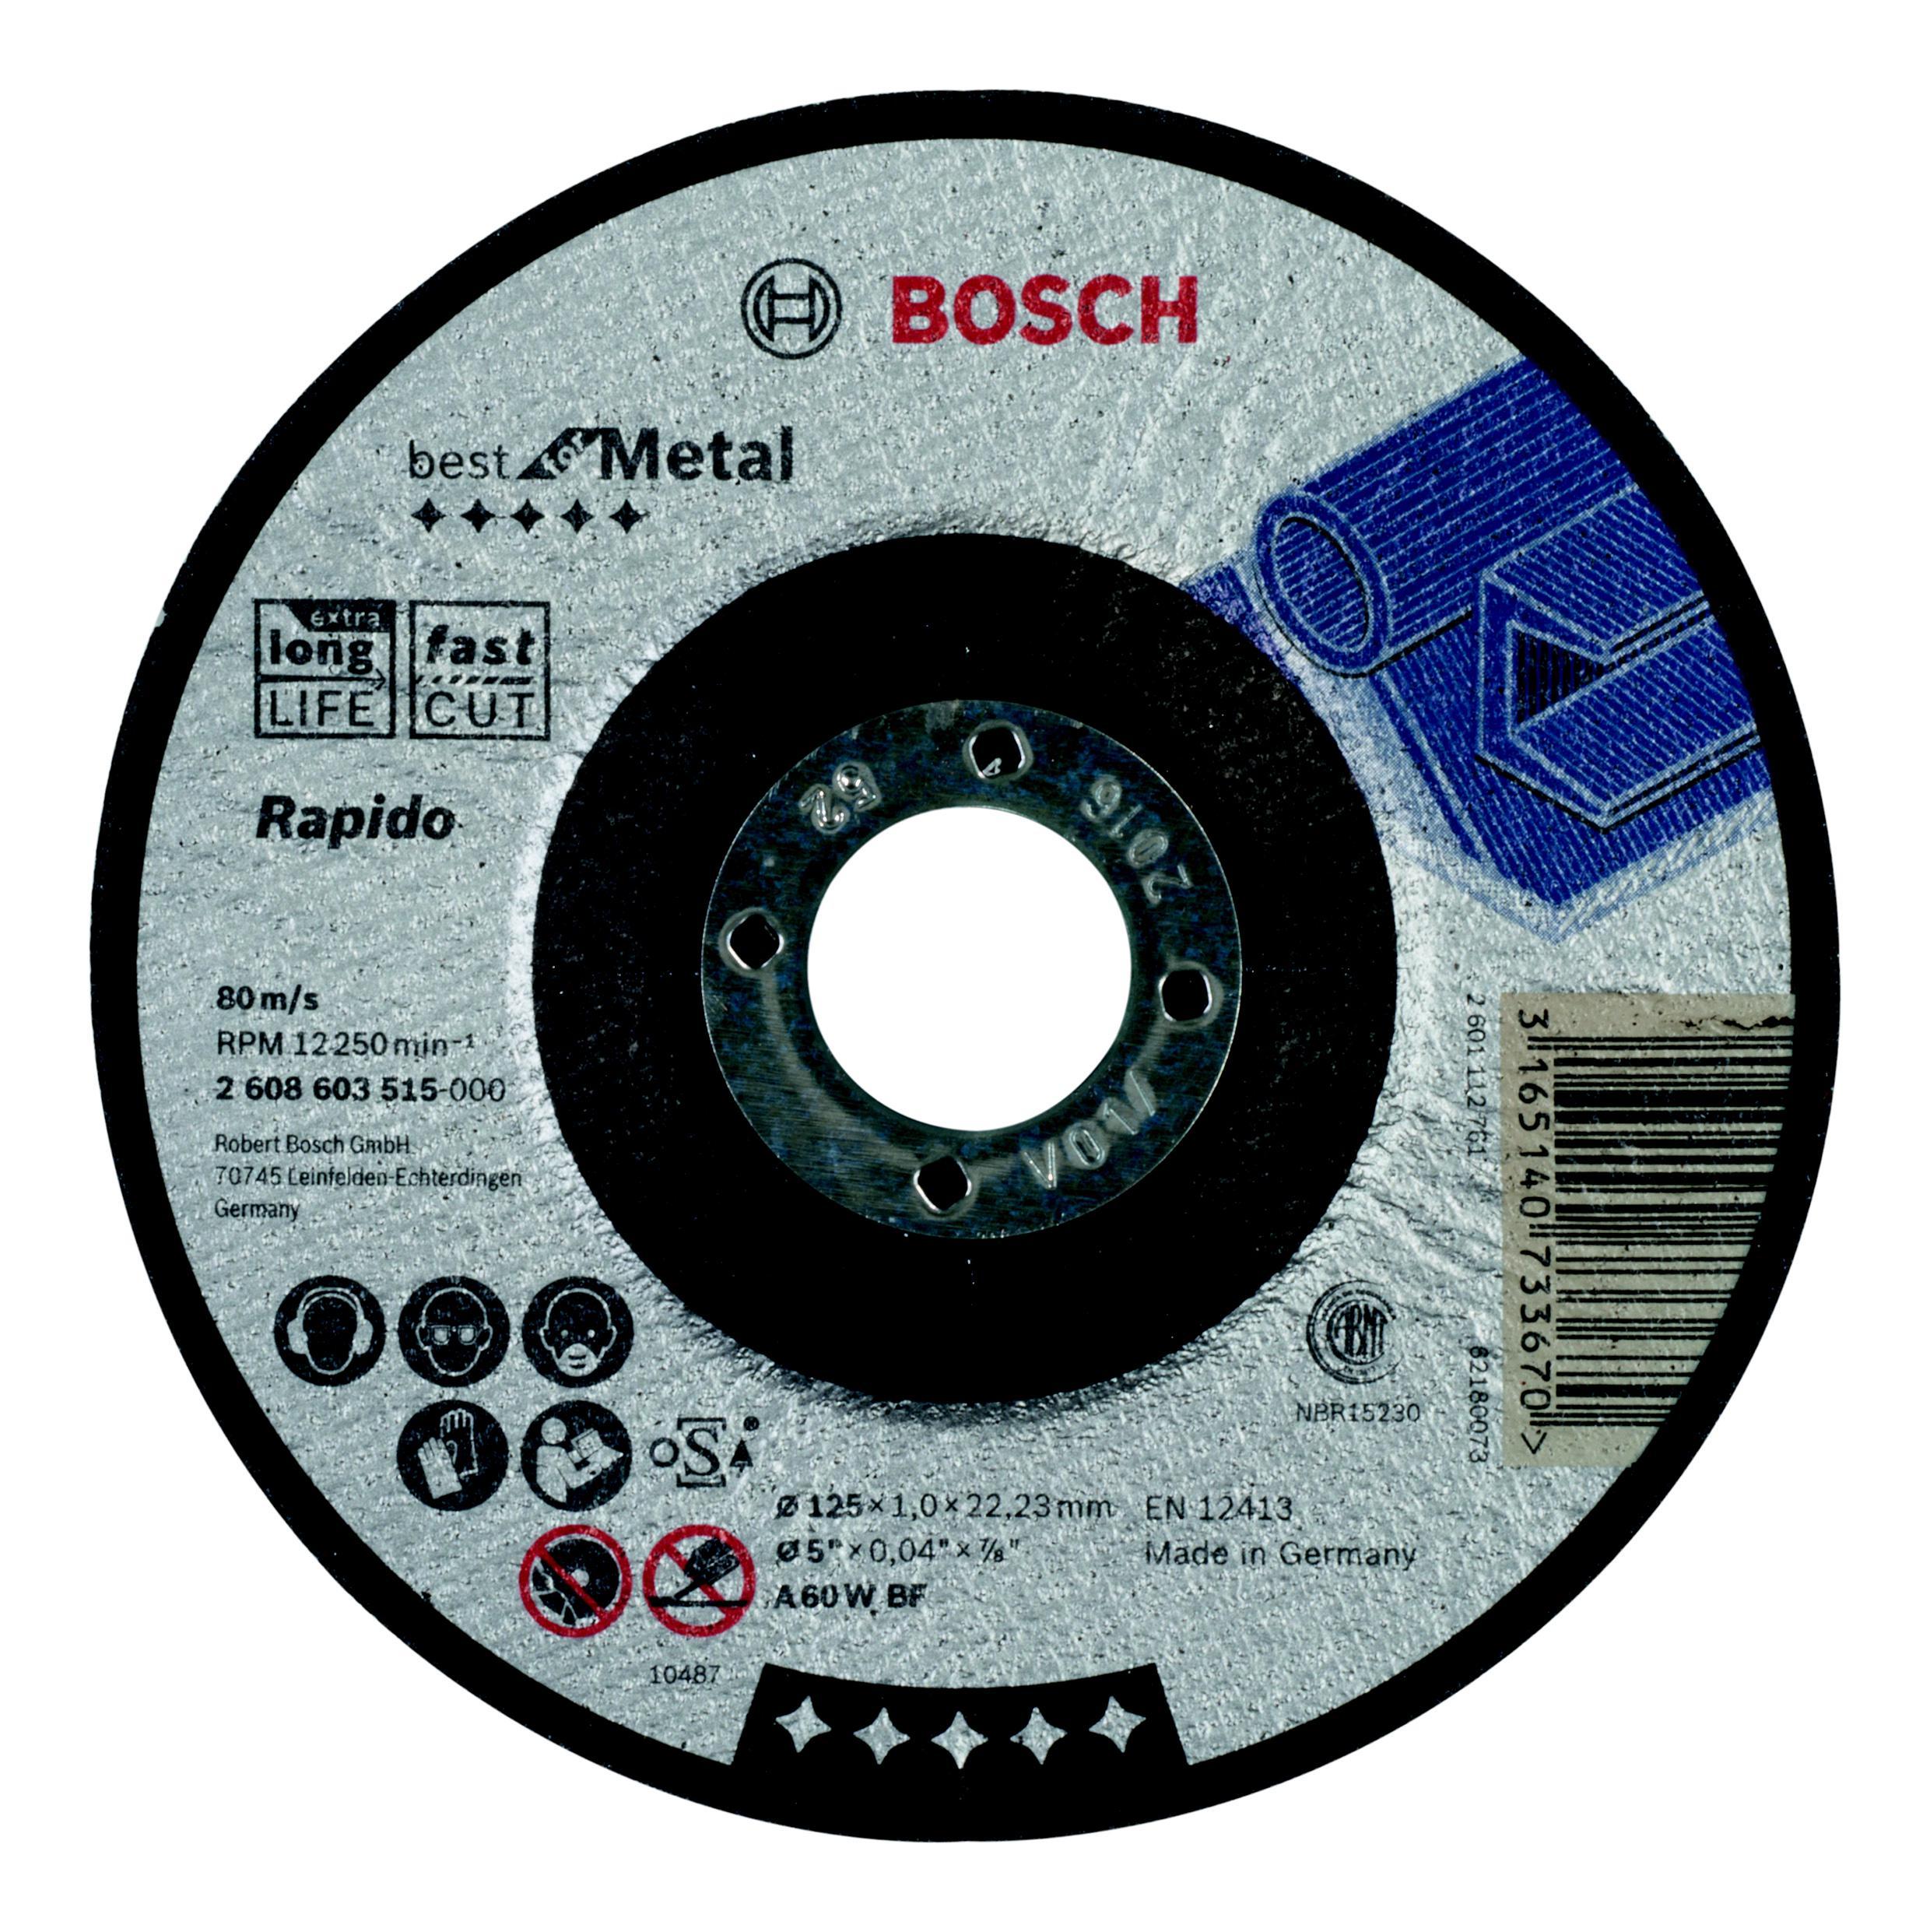 Круг отрезной Bosch 180х1.6х22 best for metal (2.608.603.521) круг отрезной bosch 115х1 5х22 best for metal 2 608 603 517